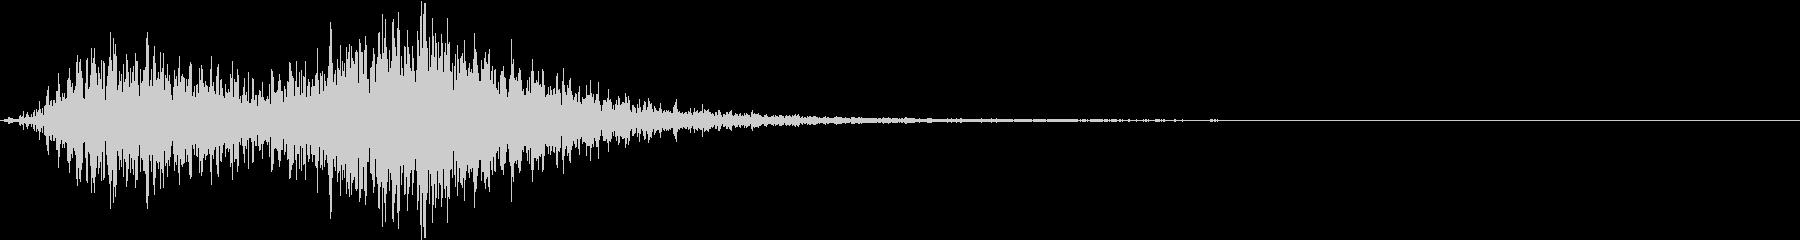 Battle 戦闘エフェクト音 4の未再生の波形